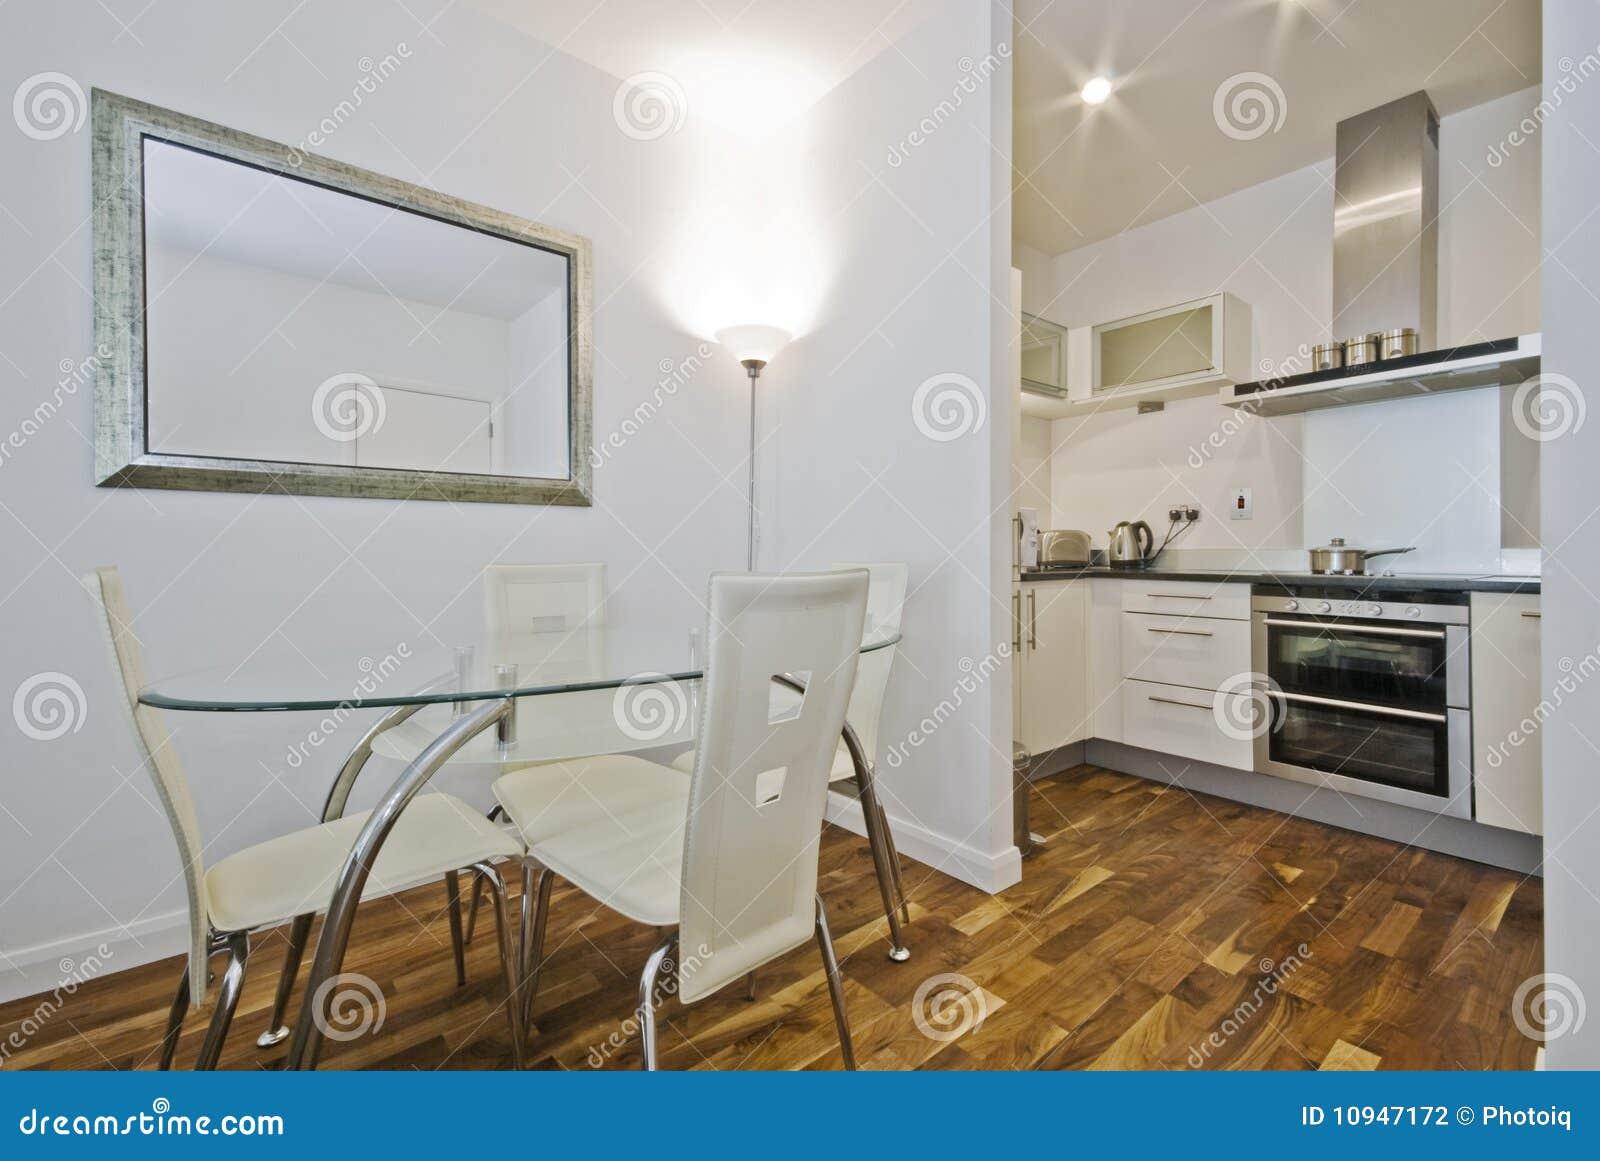 план кухни открытый